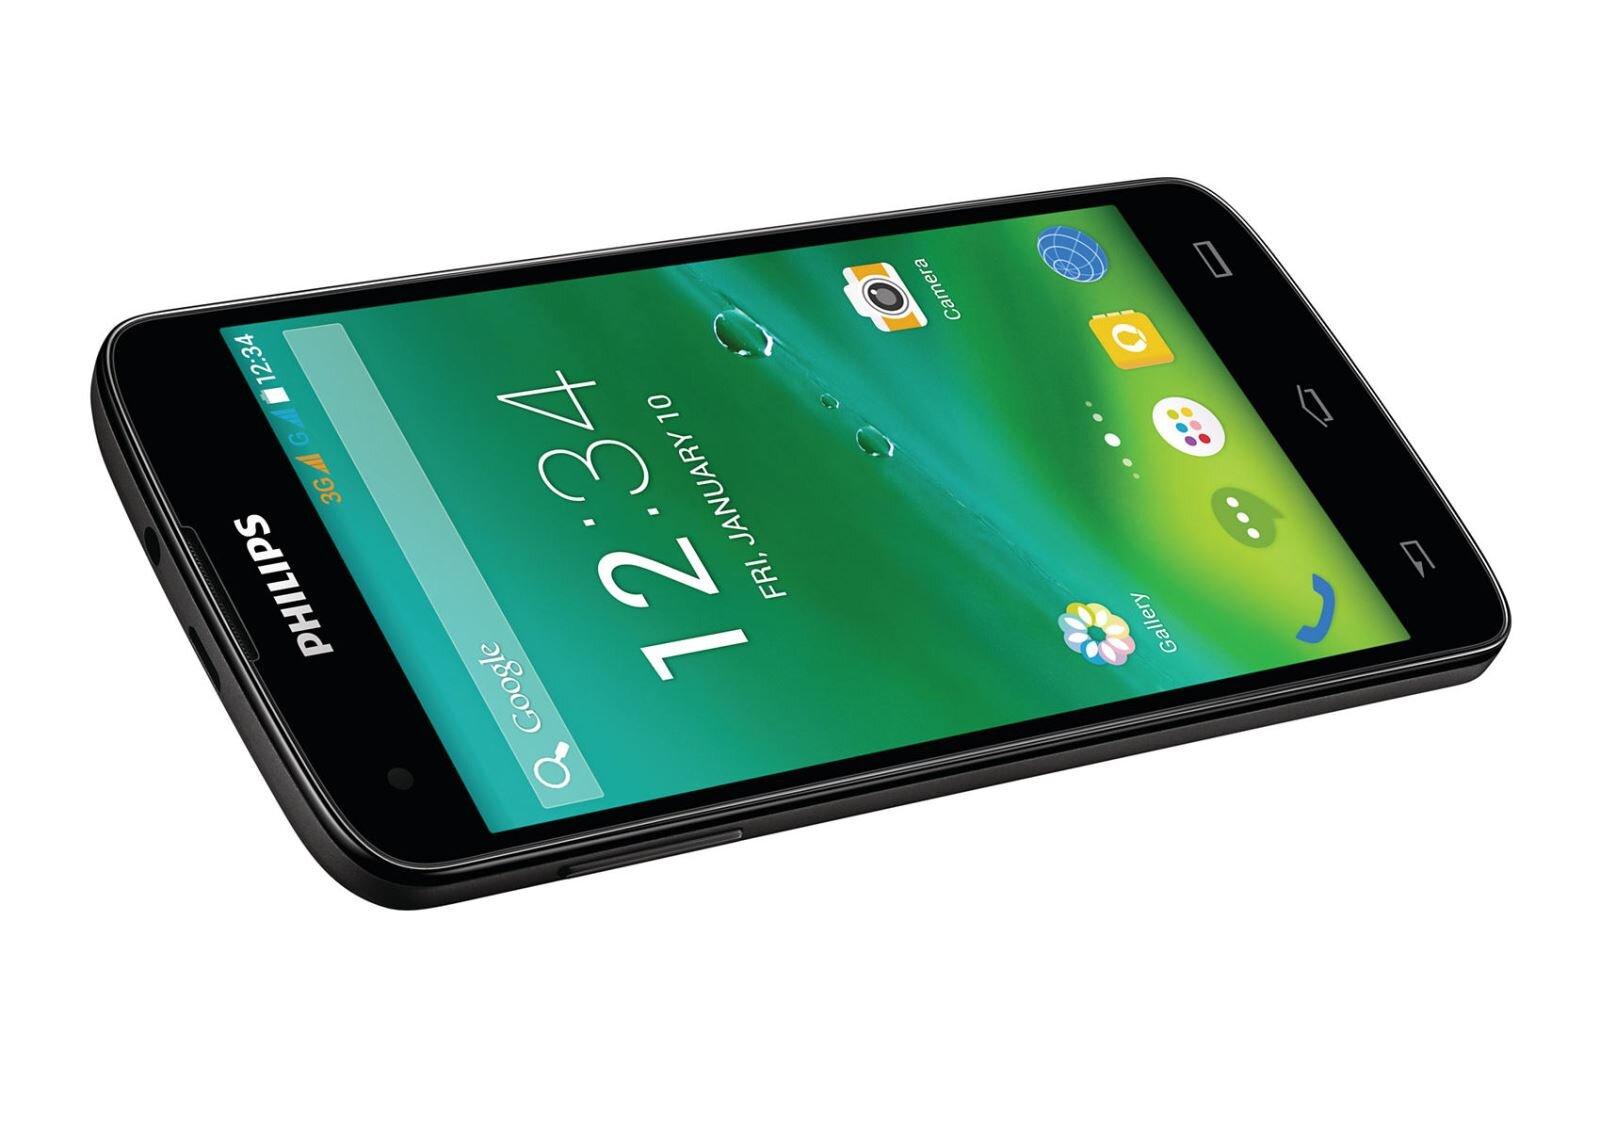 Điện thoại Philips Xenium i908 - 16GB, 2 sim